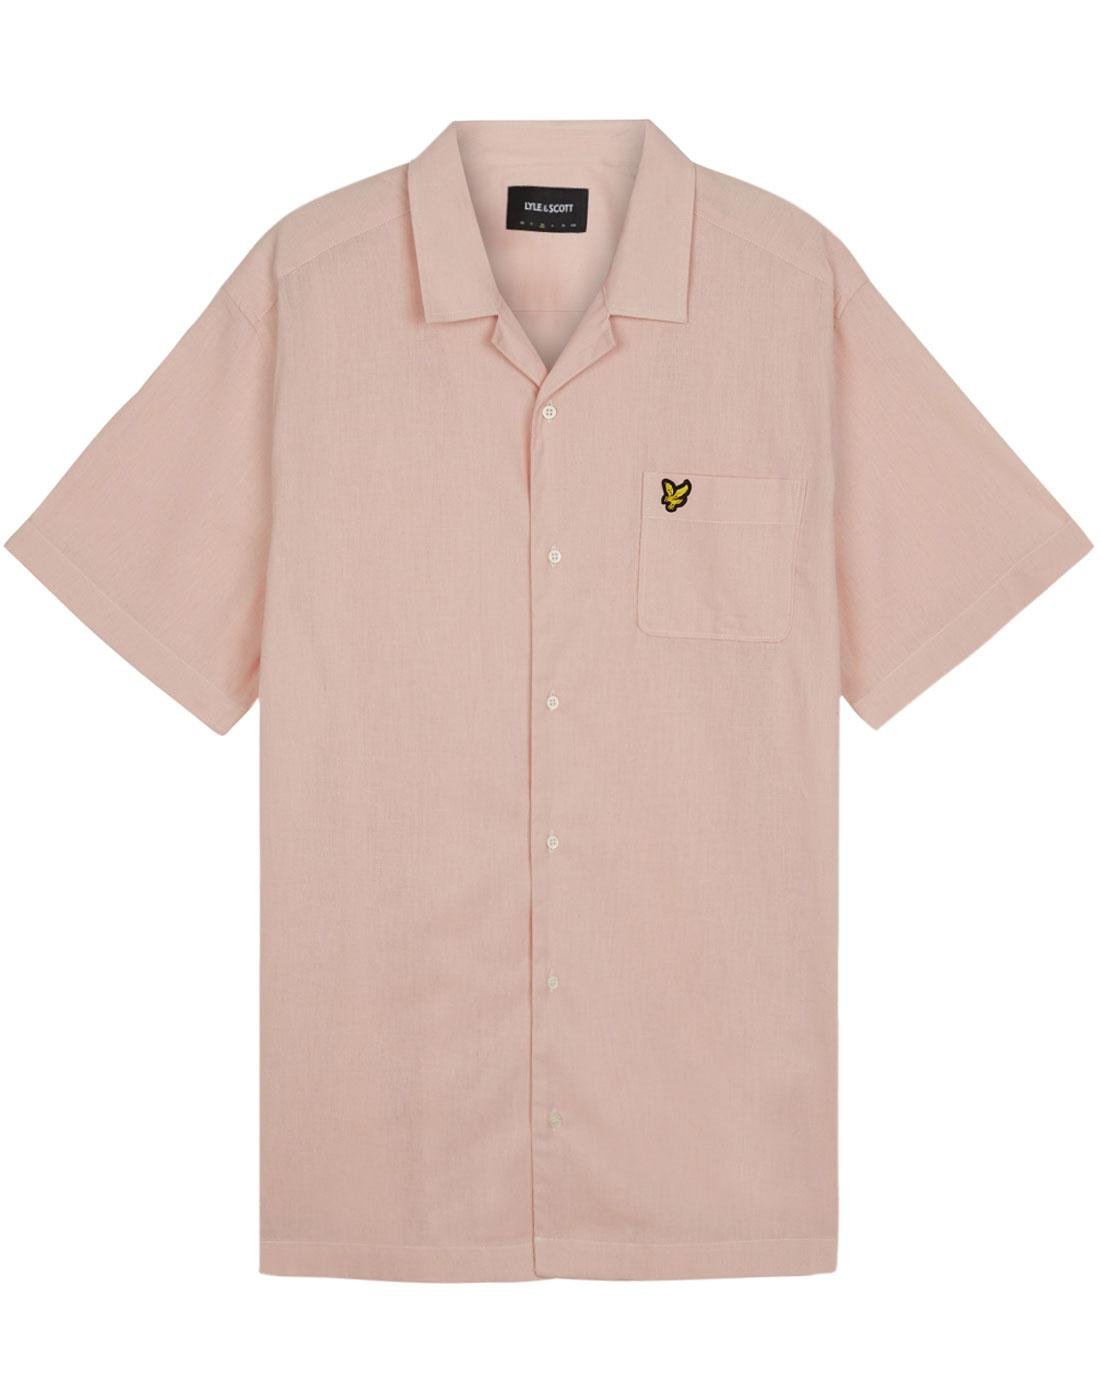 LYLE & SCOTT Retro 50s Resort Collar Shirt (Pink)